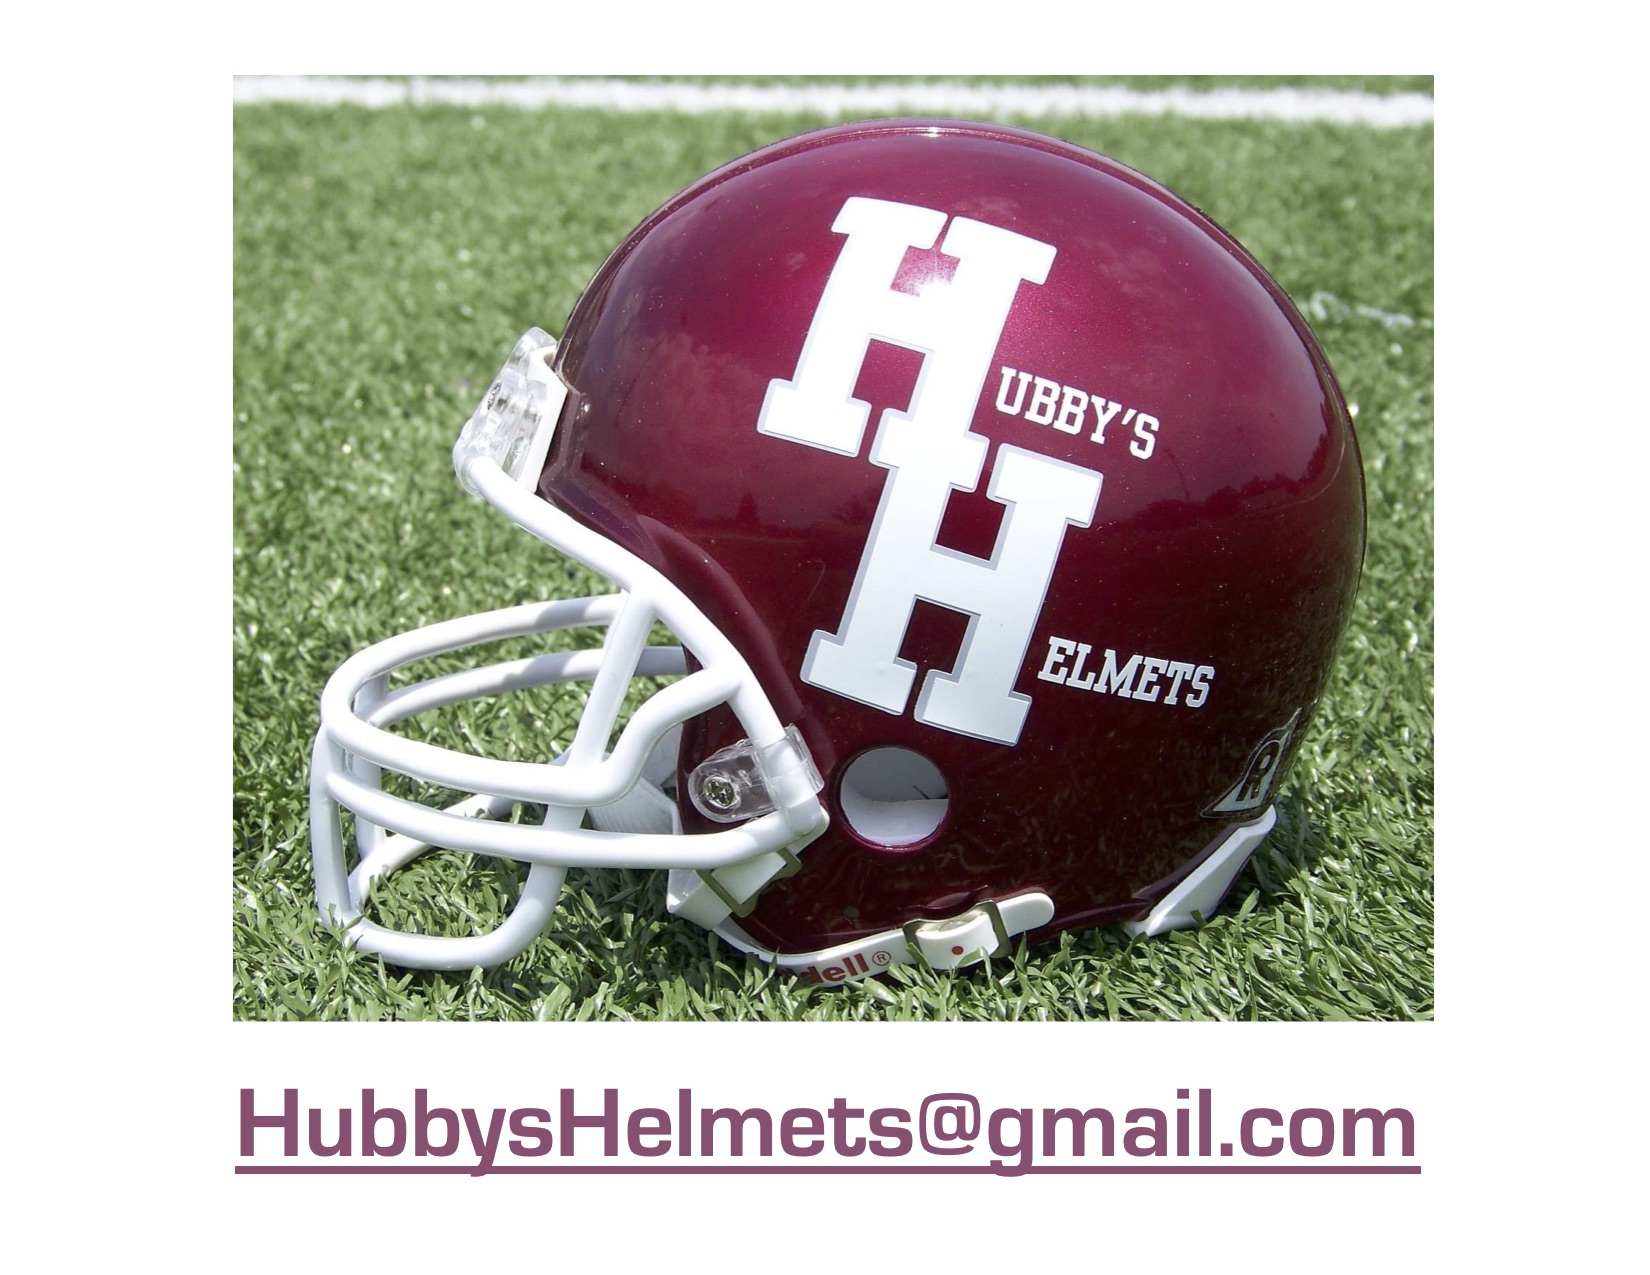 Prize Sponsors - Hubby's Helmets - Logo